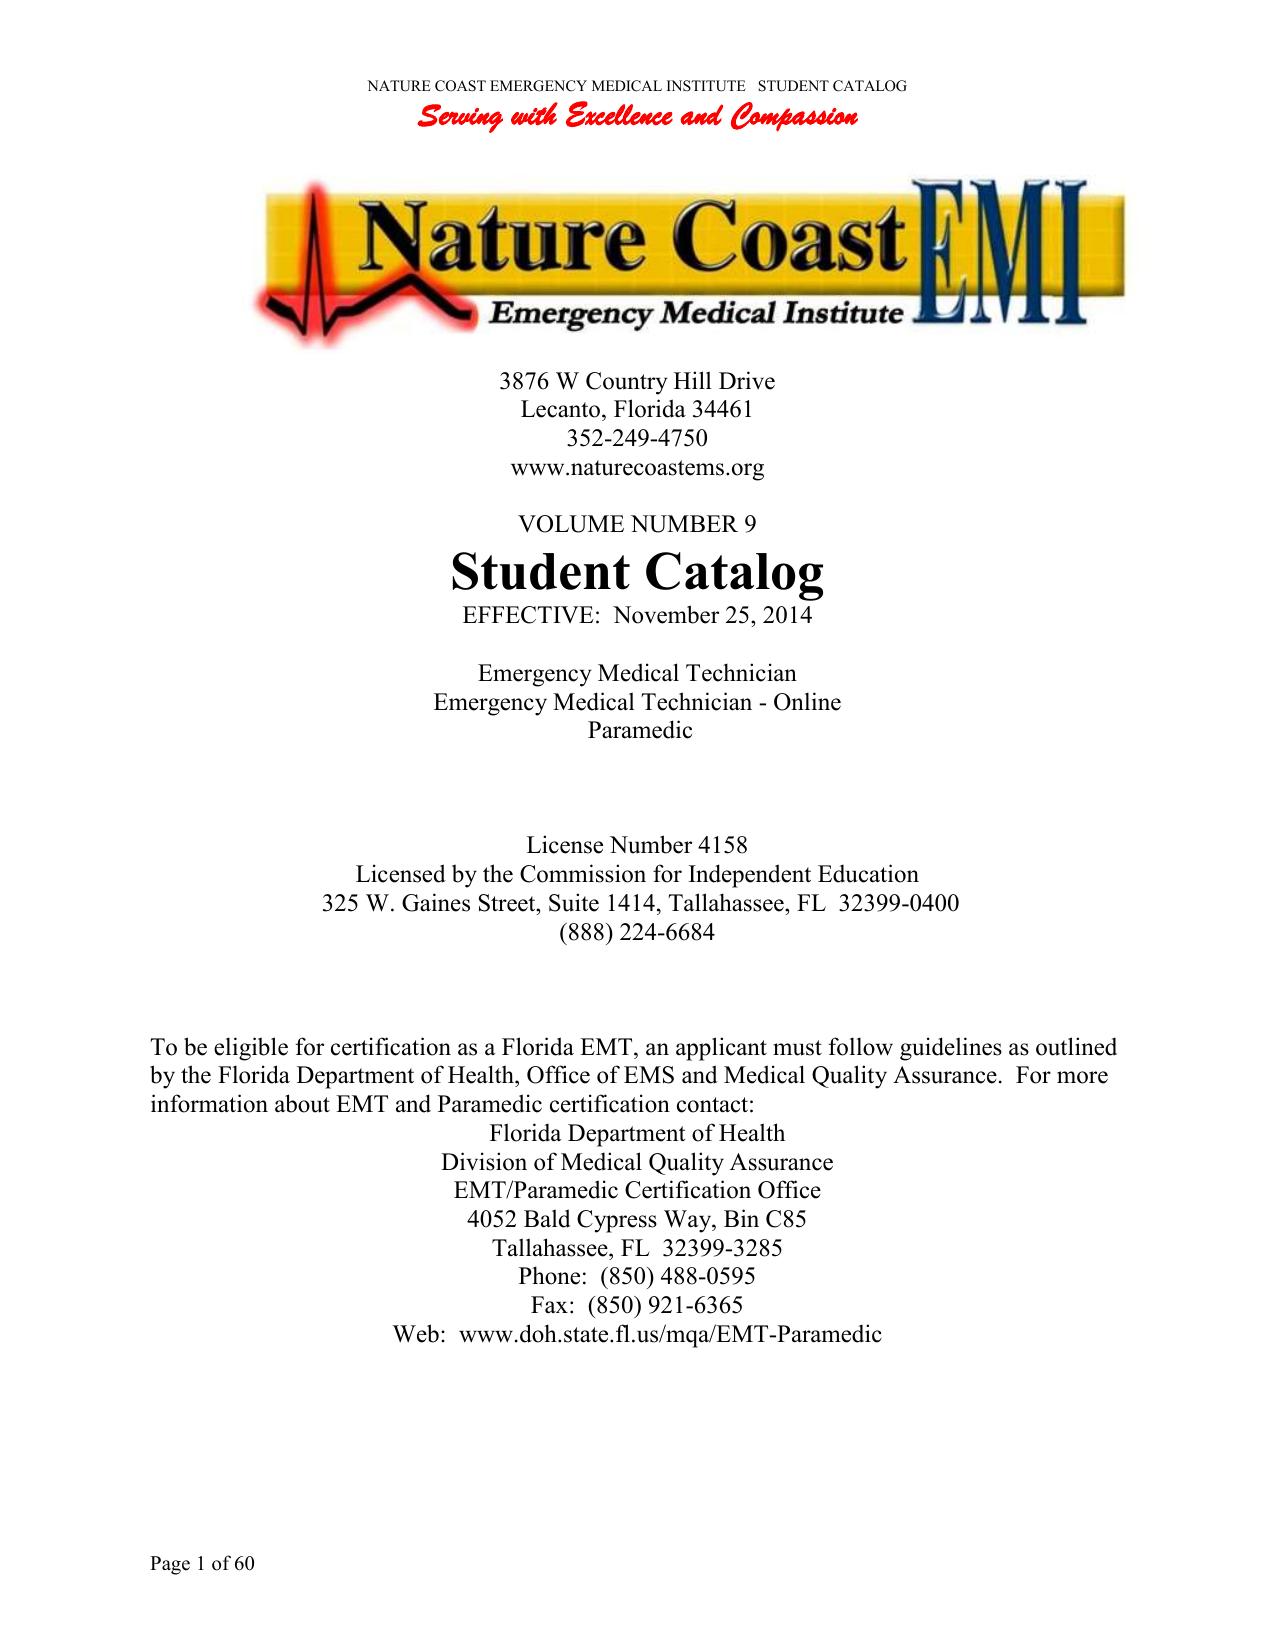 Student Catalog - Nature Coast EMS